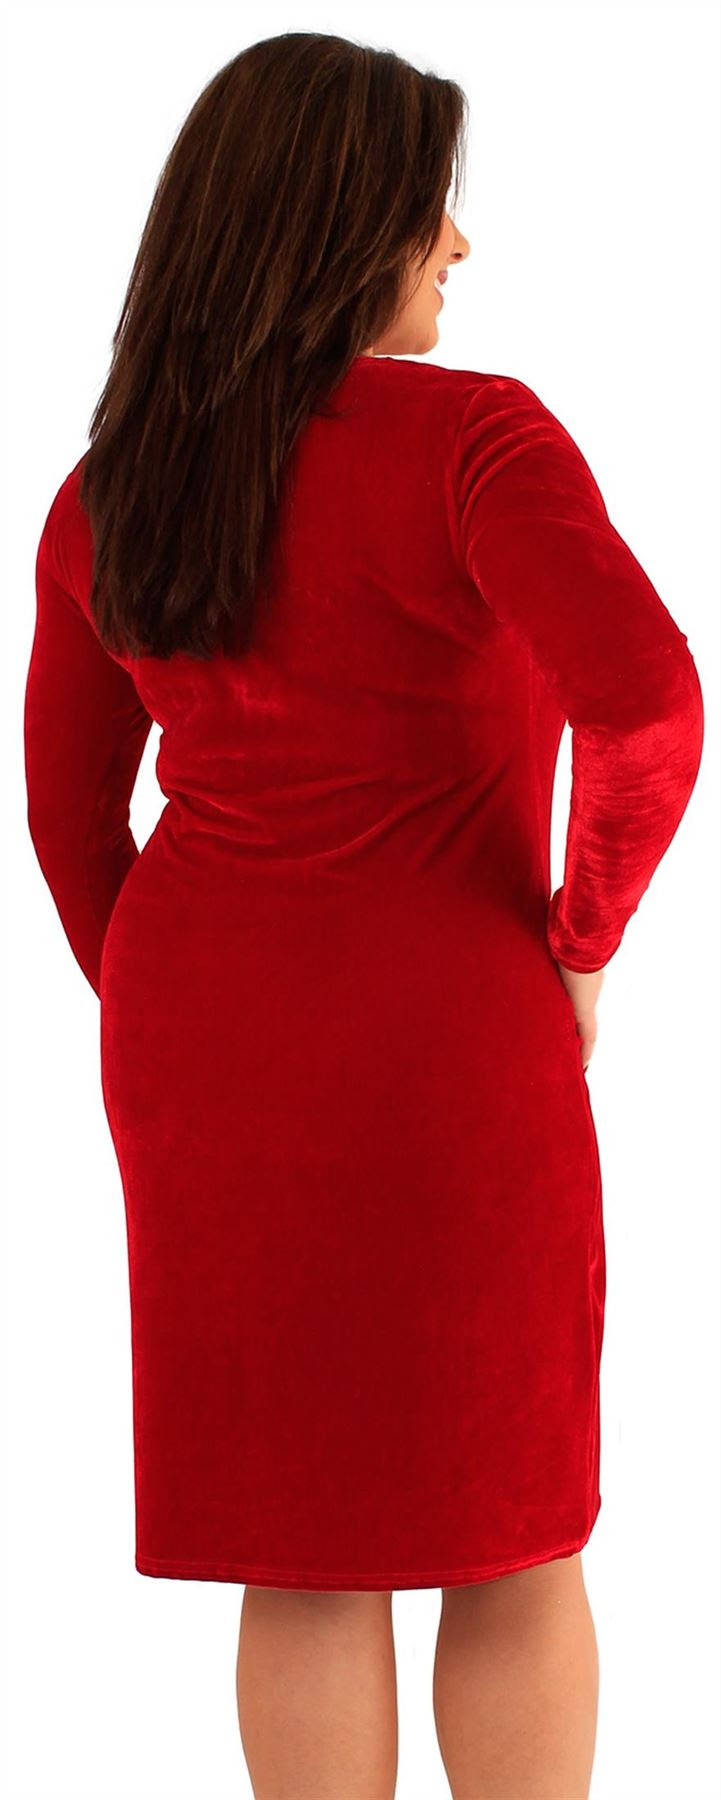 Vintage plus bodycon long sleeve dresses size womens